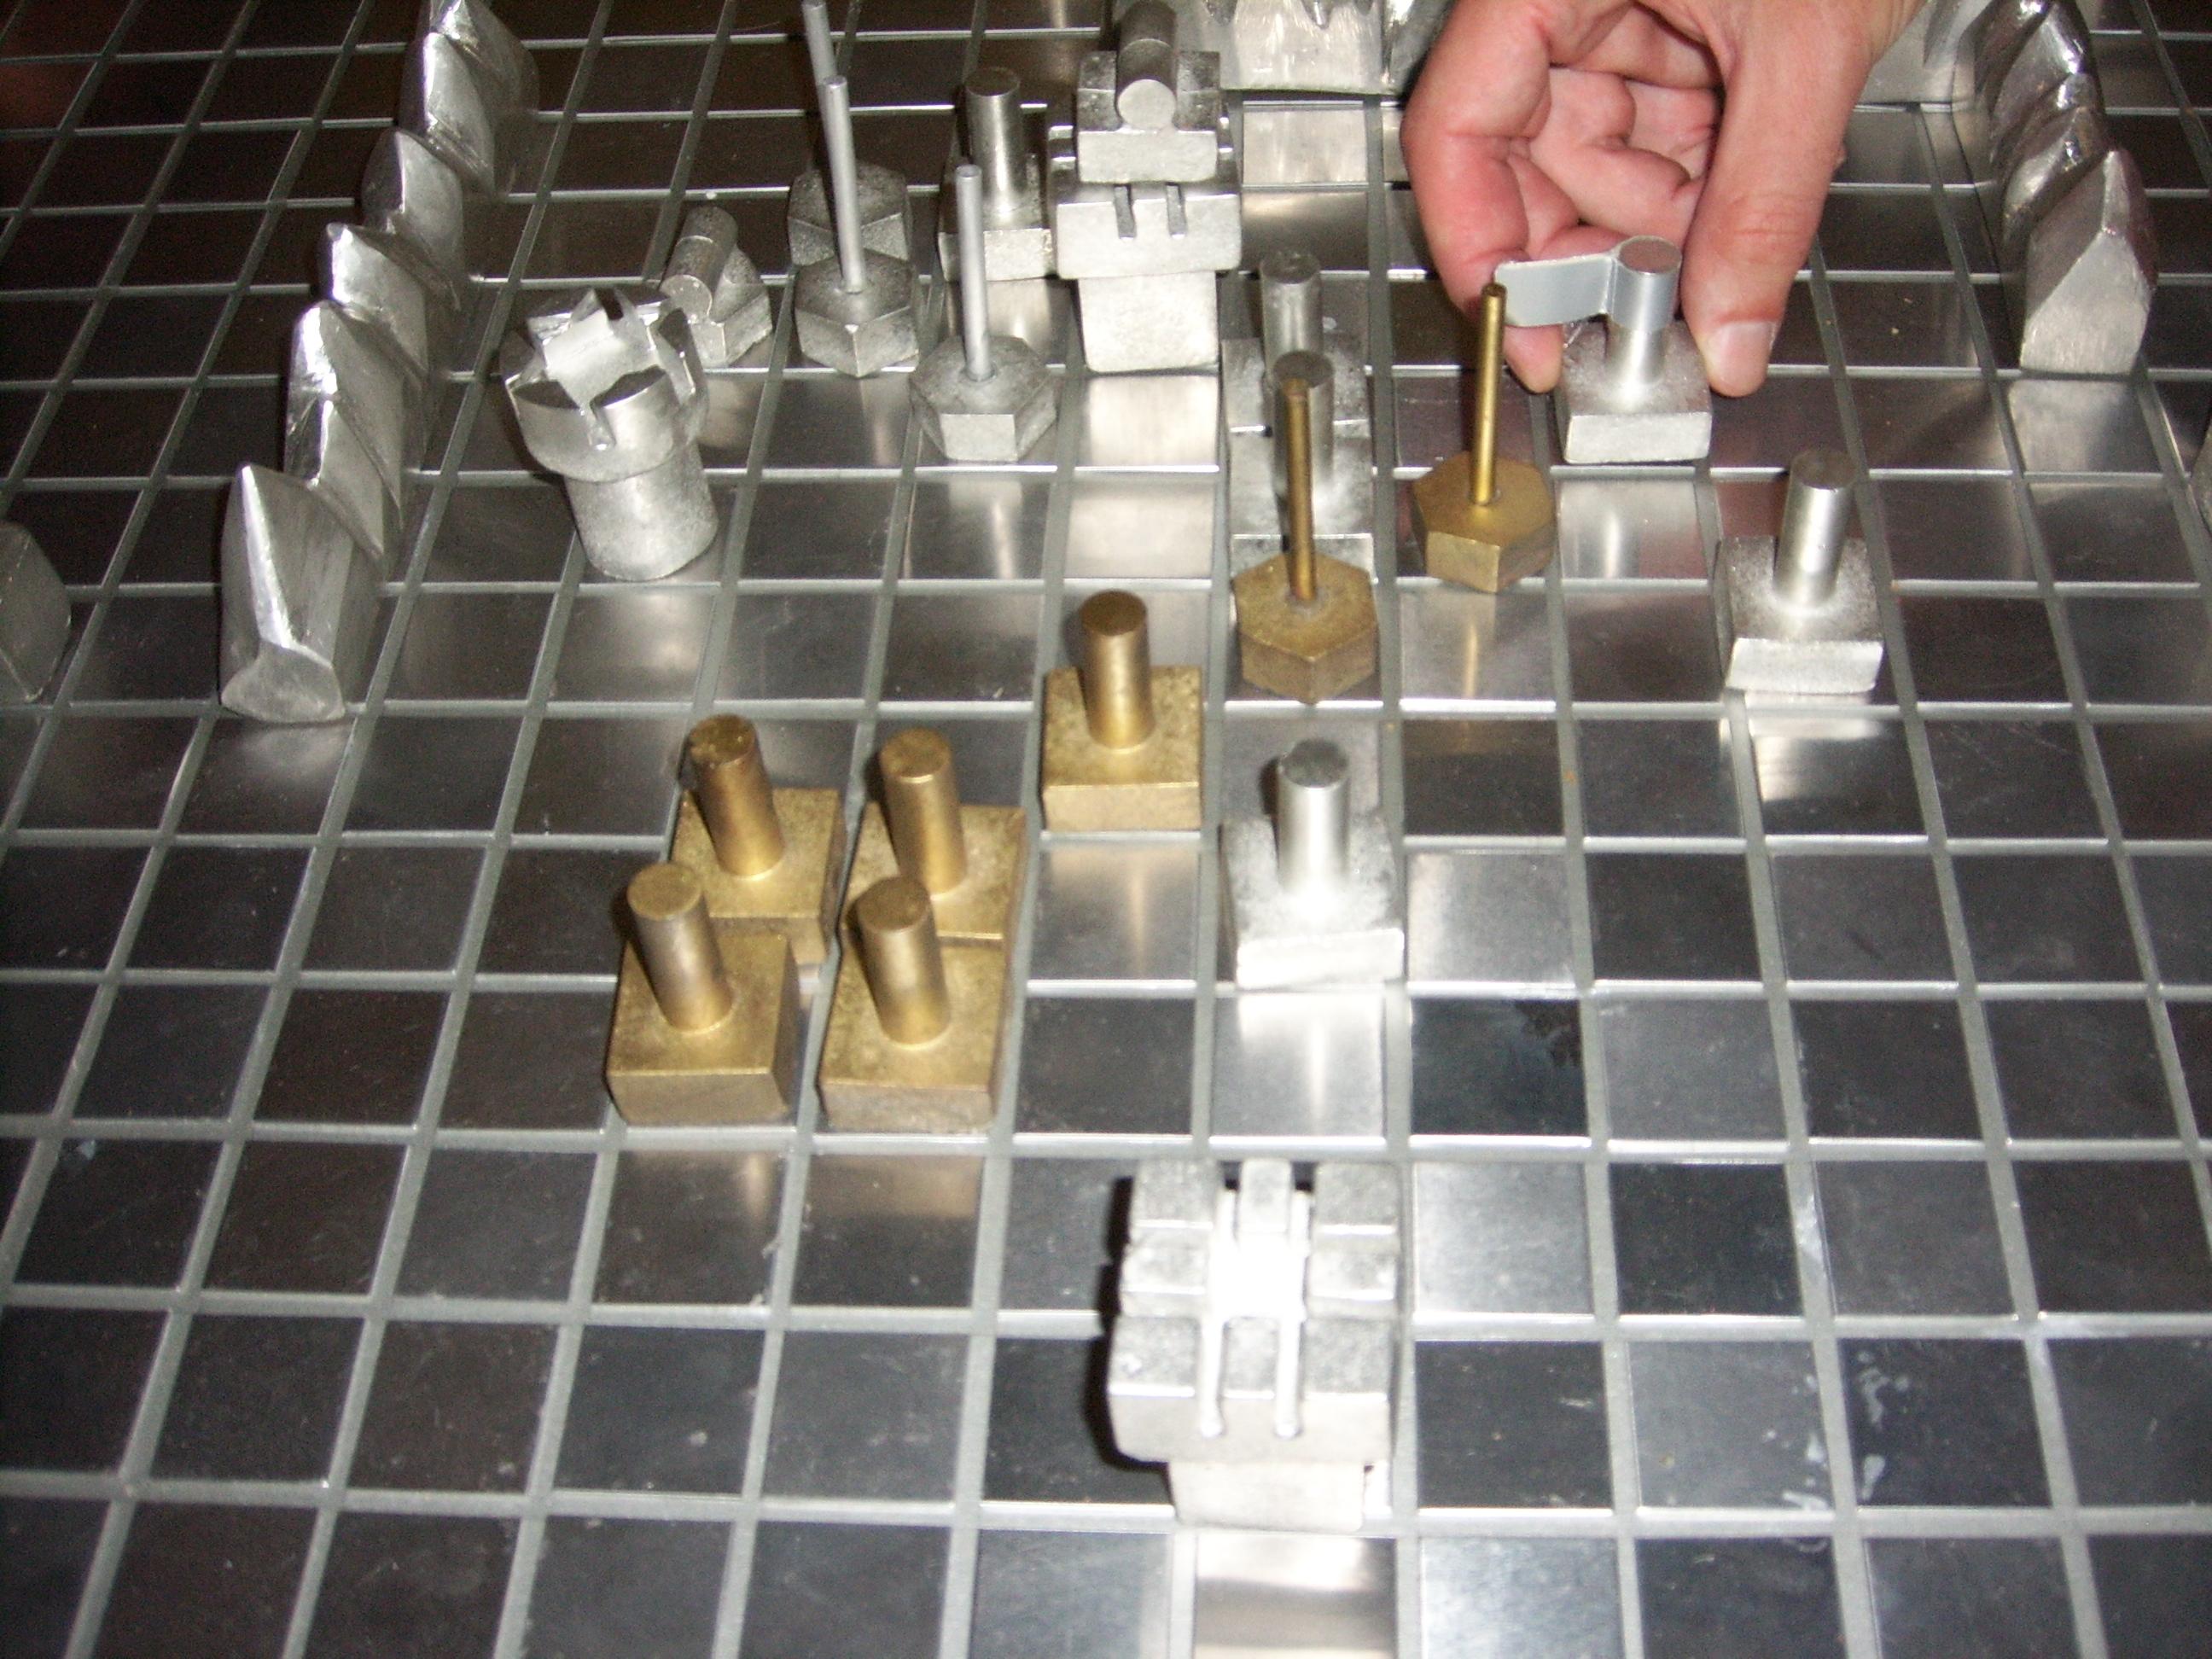 endgame_position_1